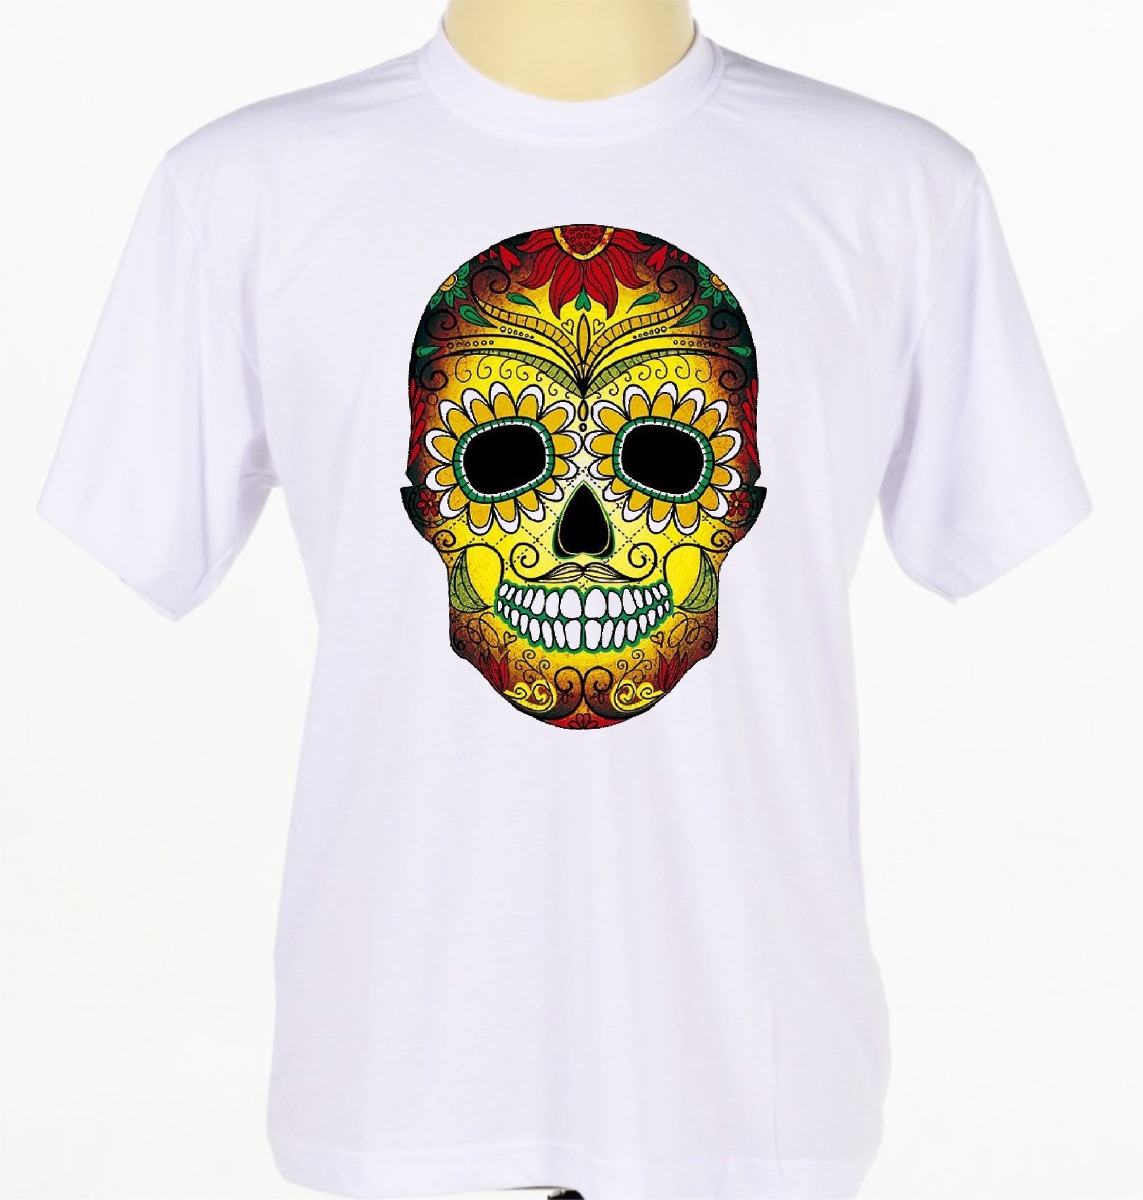 3d6d0913df7d3 camisa camiseta estampada caveira mexicana catrina colorida. Carregando  zoom.